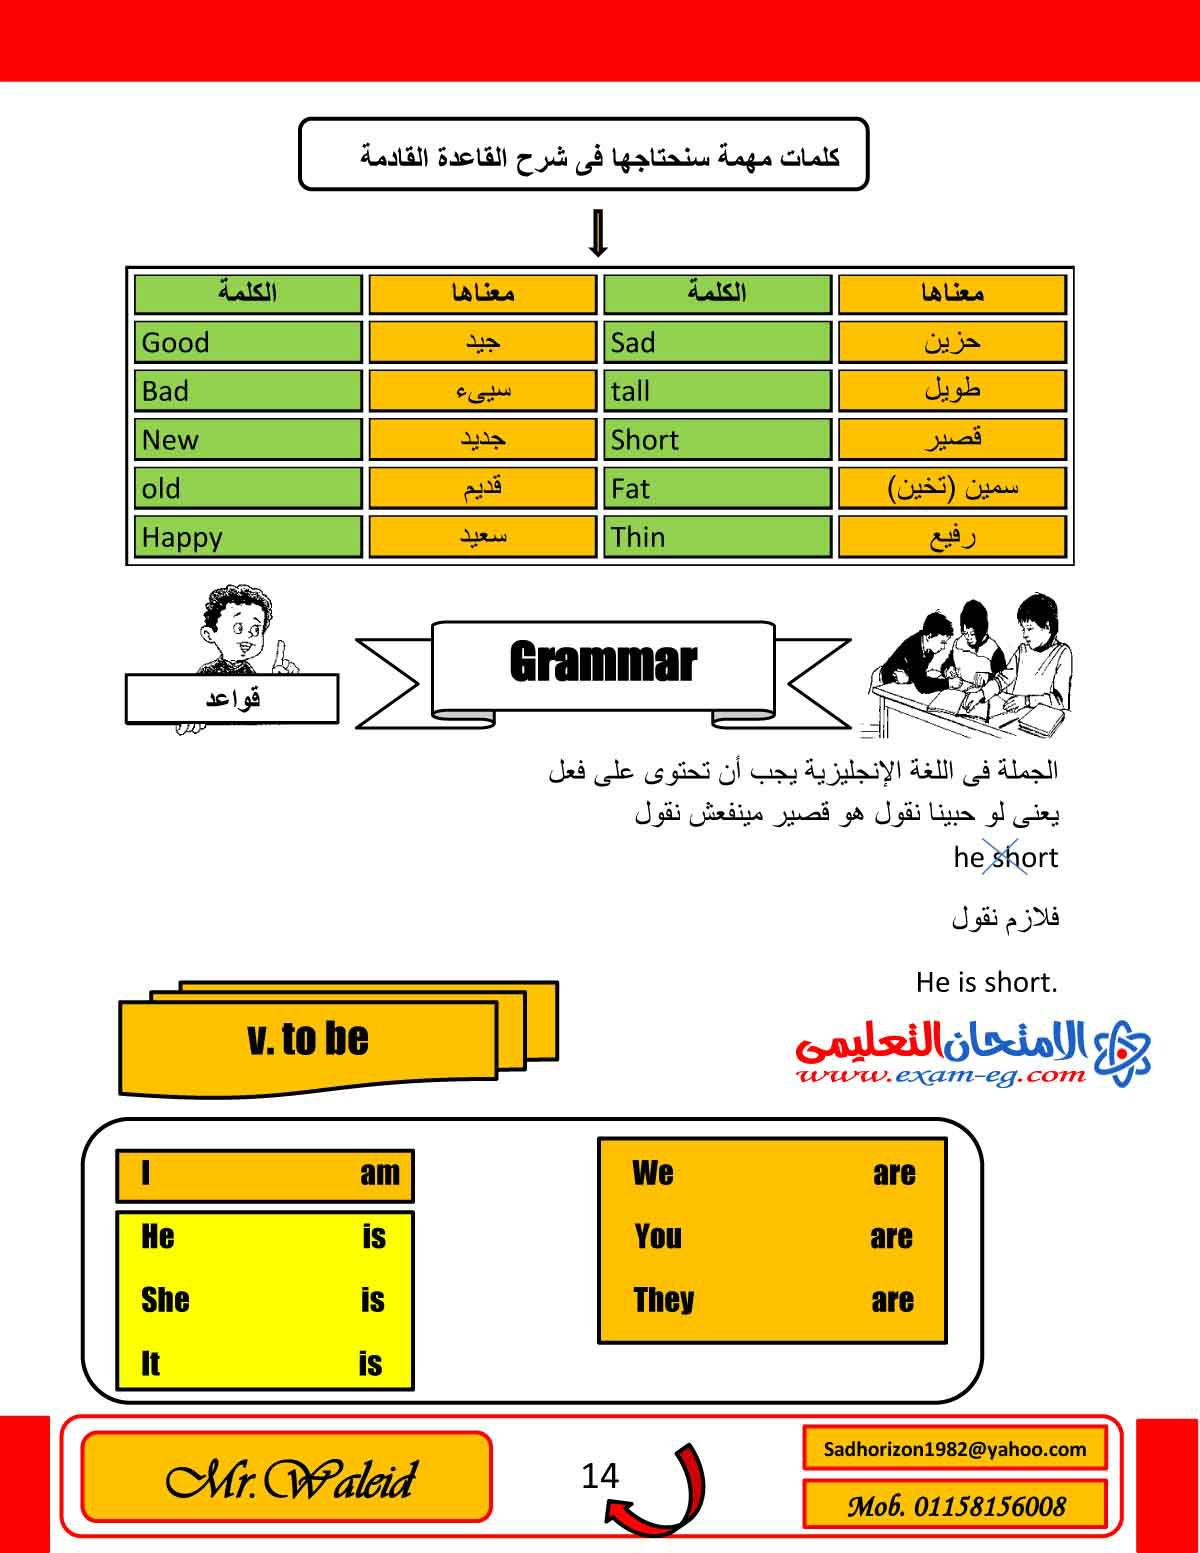 exam-eg.com_1449405243714.jpg